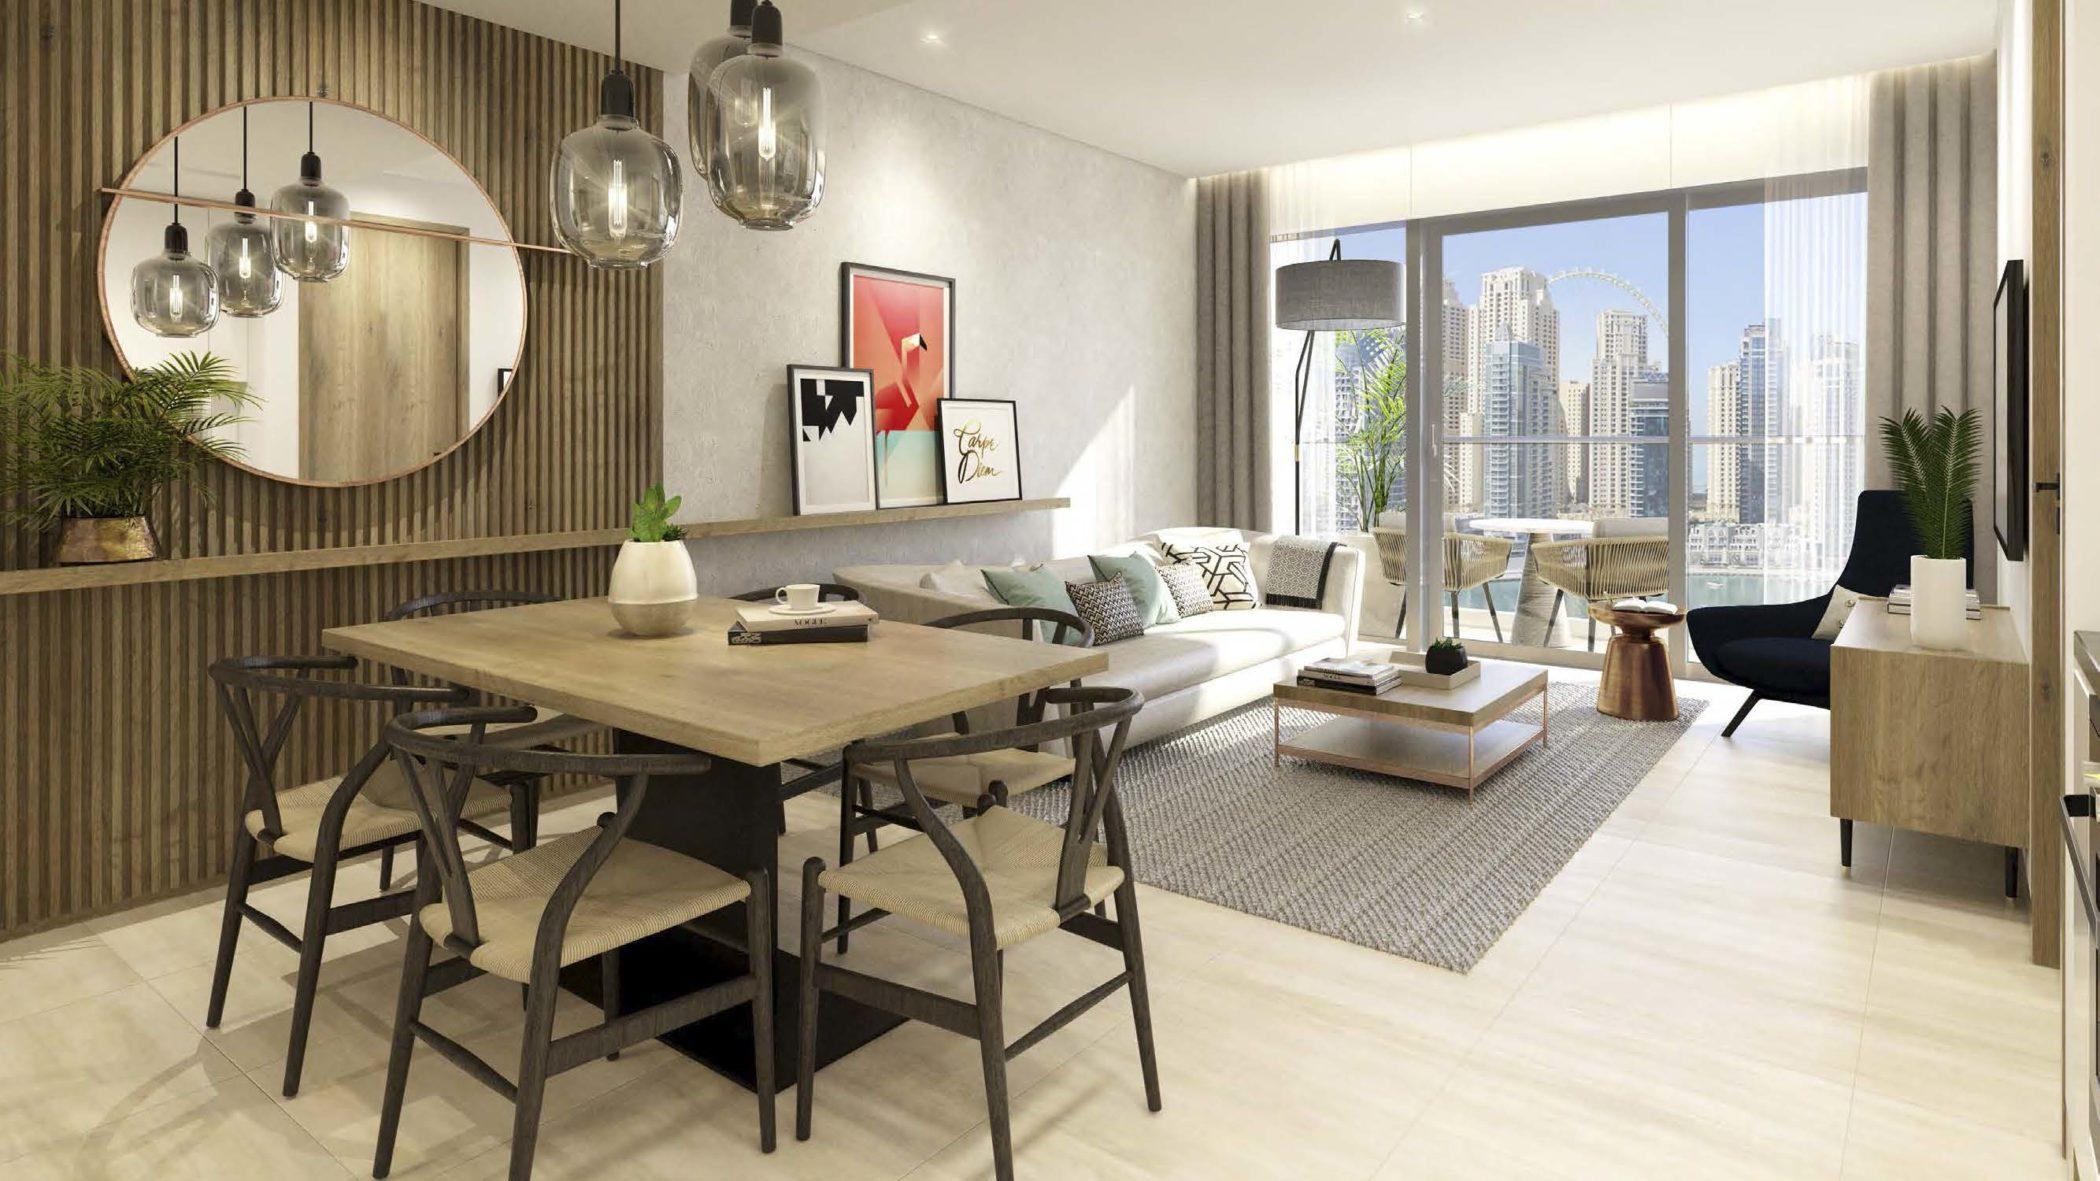 Vida Residences by Emaar at Dubai Marina. Luxury apartments for sale in Dubai